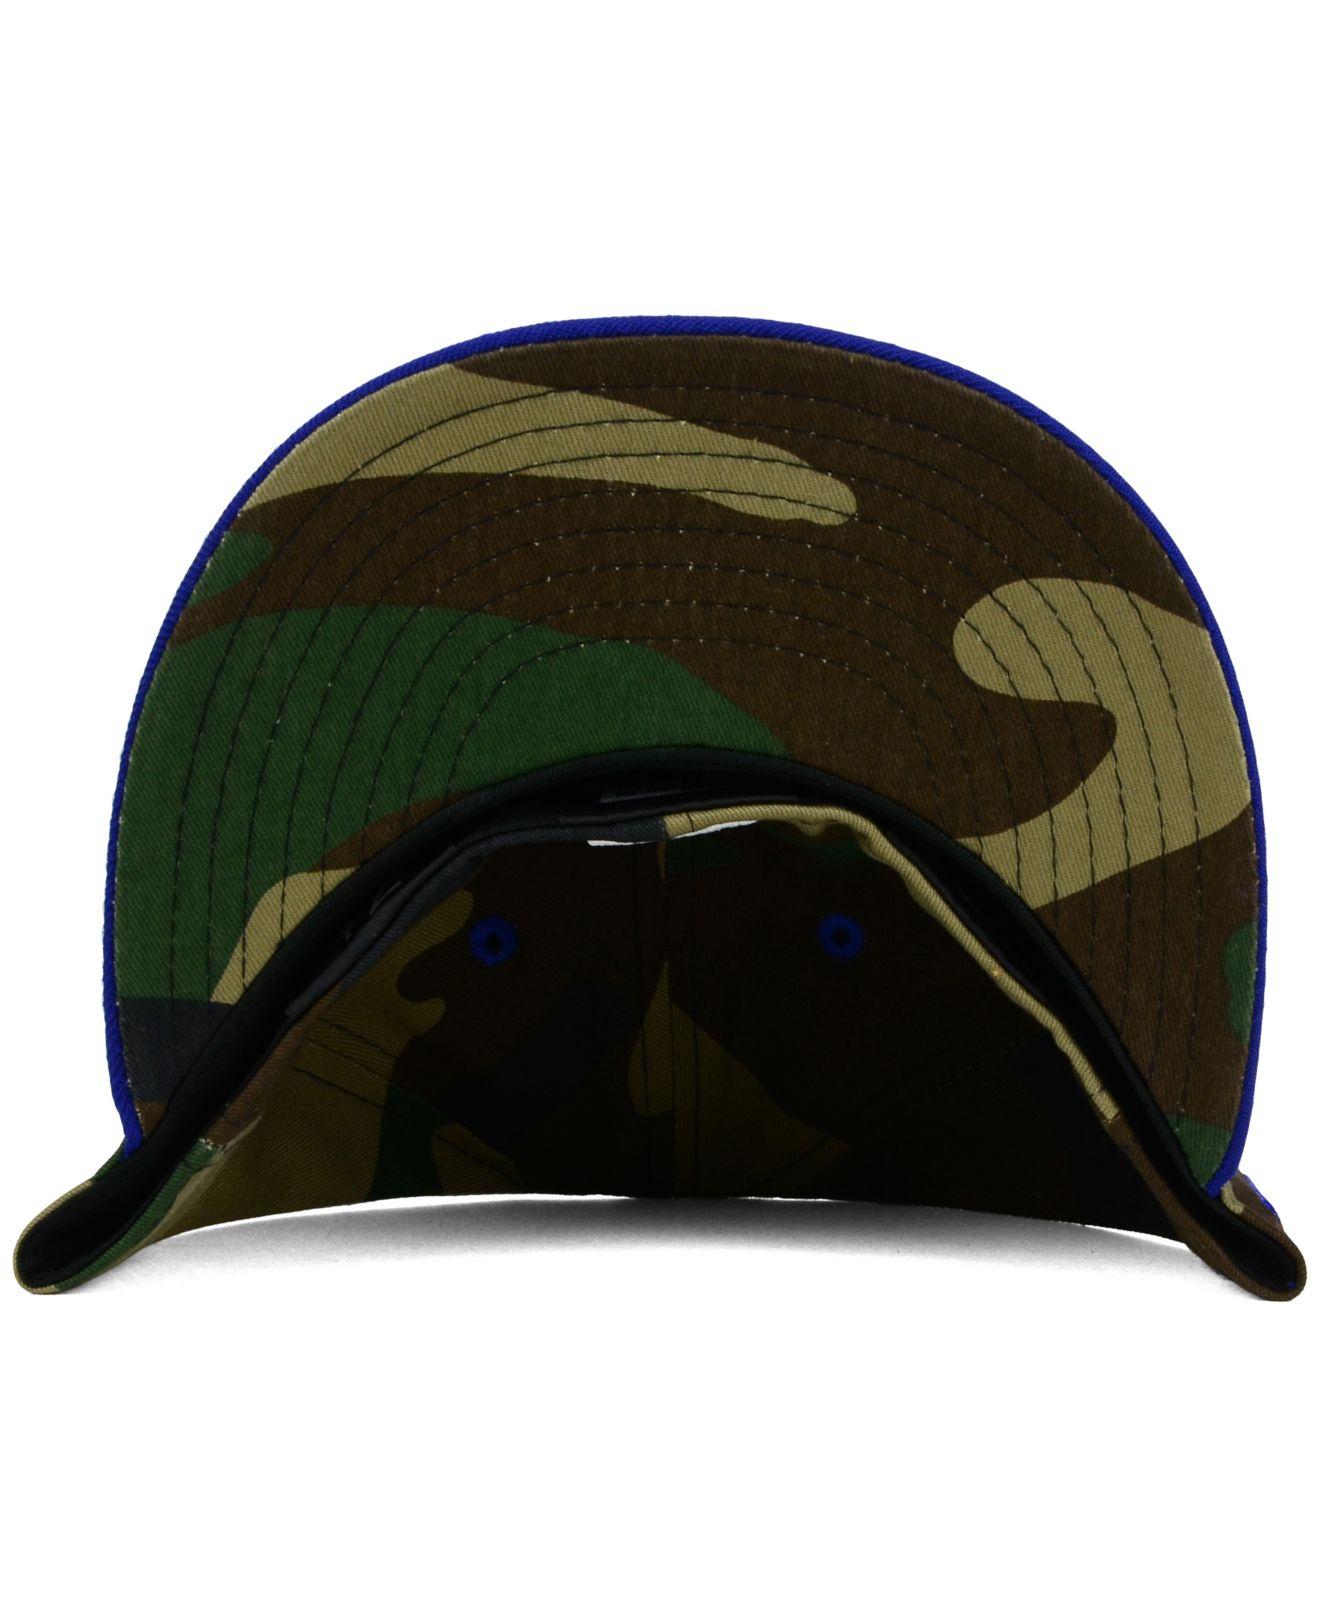 factory price 209af 439a3 ... get hat lyst ktz new york mets camo pop 59fifty cap for men fb800 02413  ...